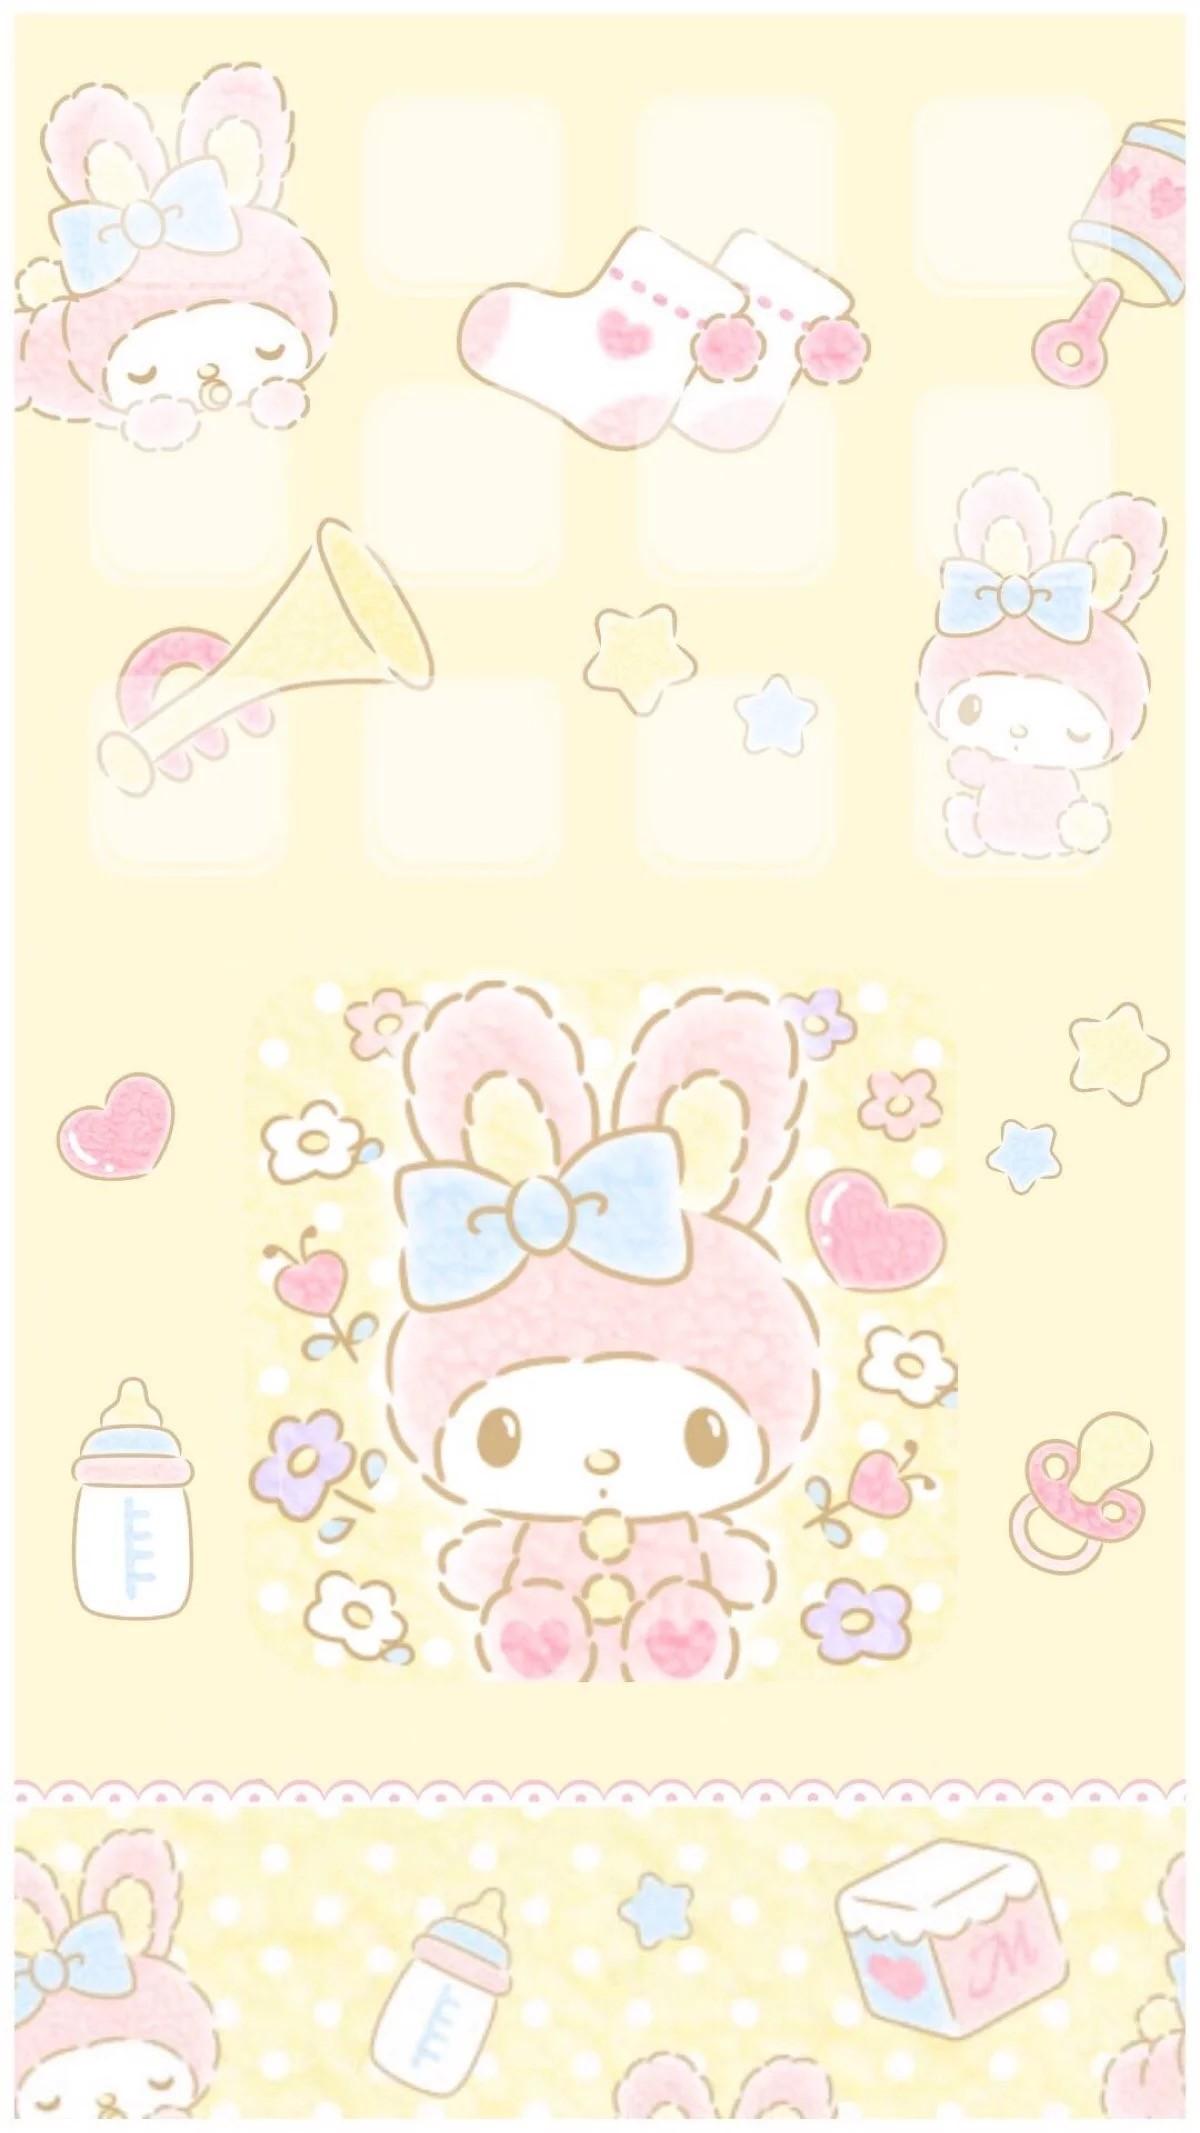 1238x1968 Kitty Wallpaper Iphone Sanrio Characters Kawaii Stuff Hello Fun Followers Cartoons Thanks